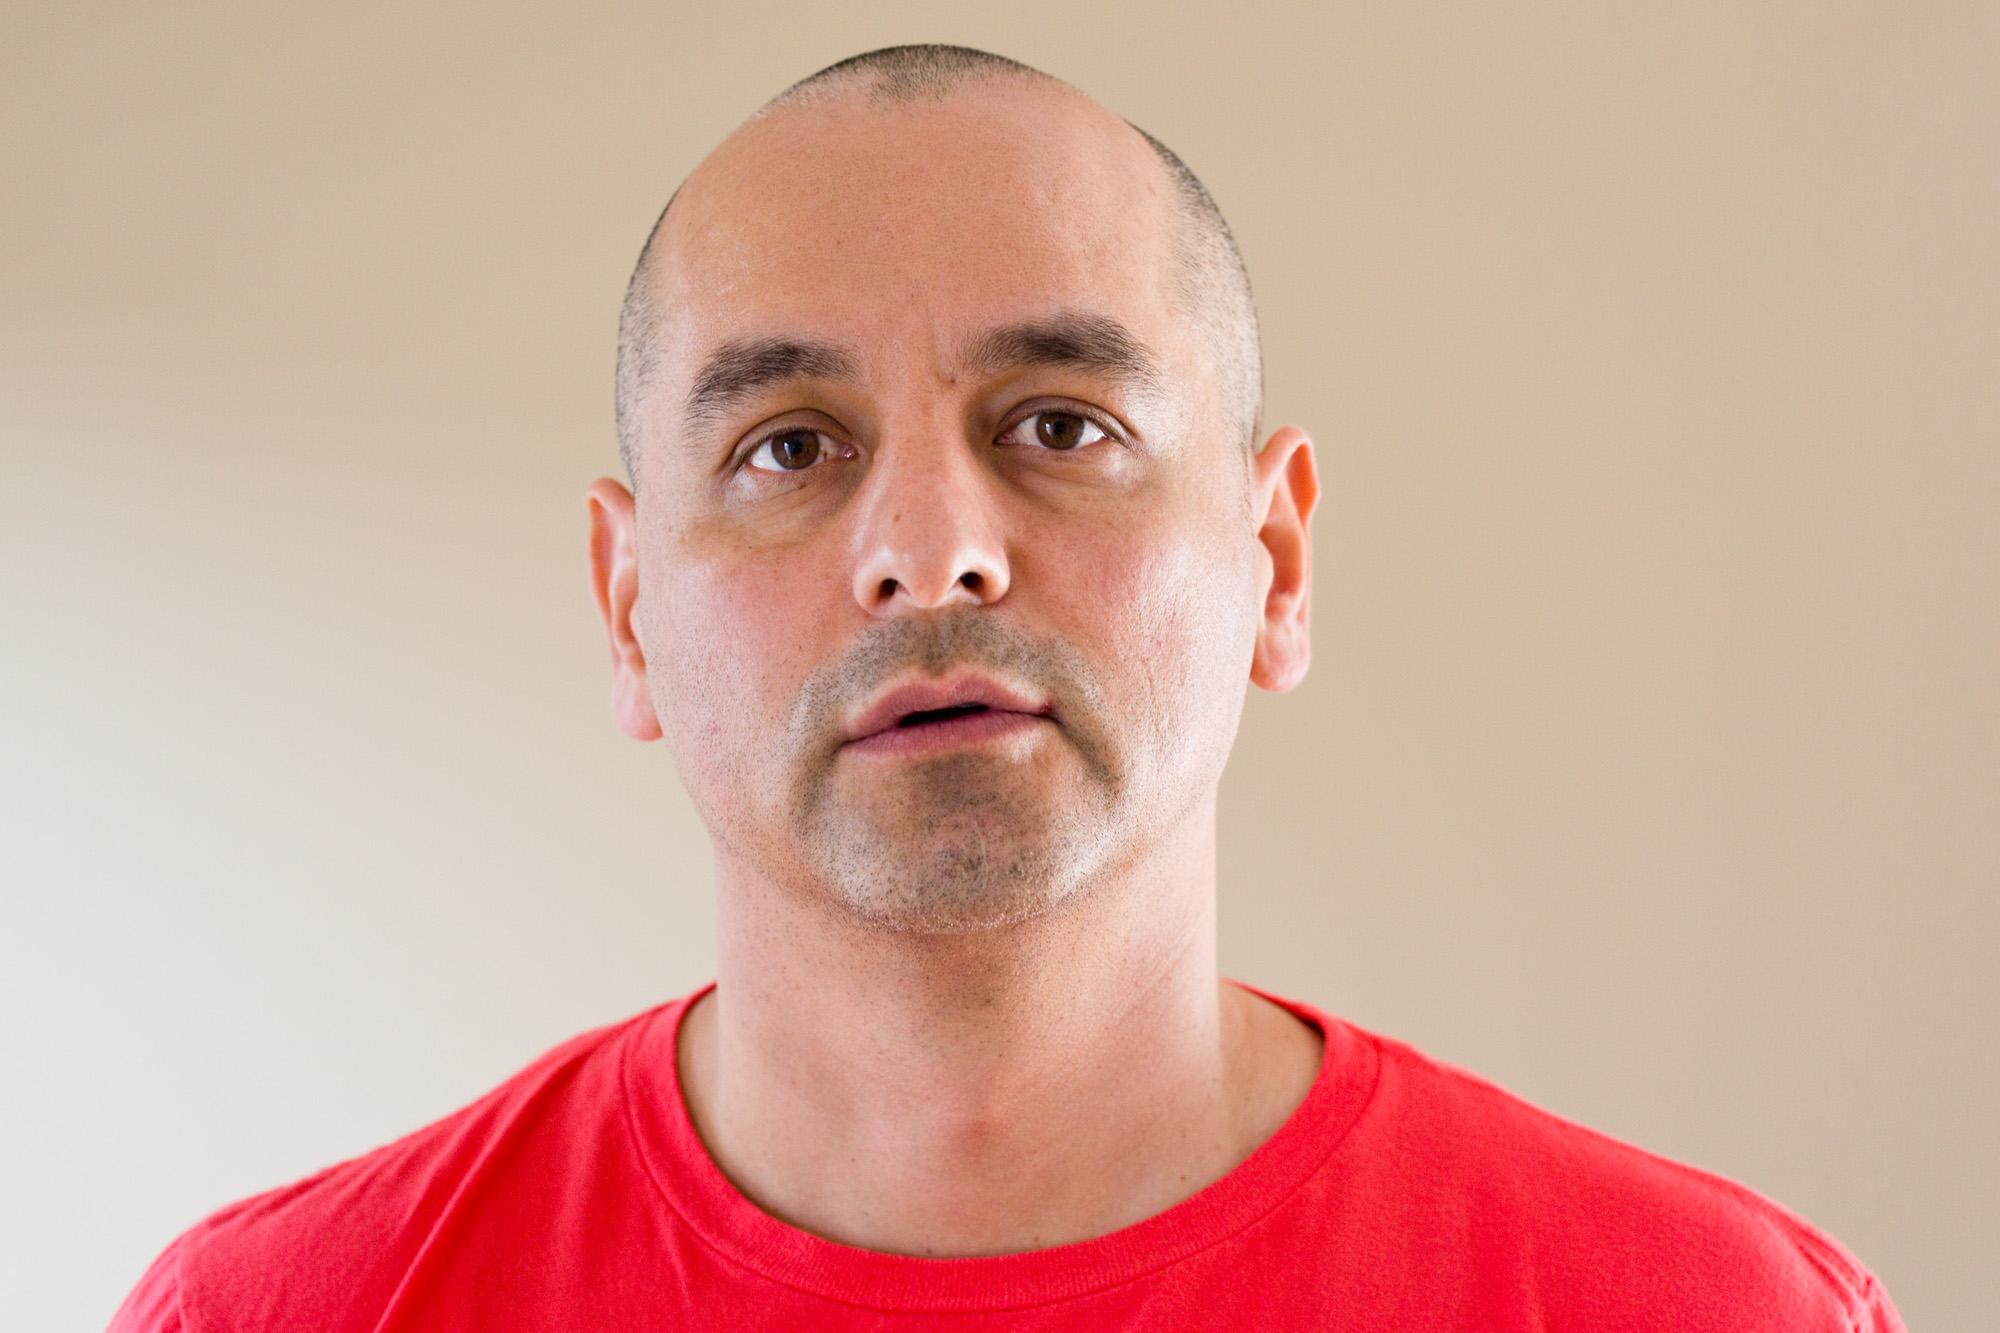 Carlos Salcedo, 42, at his office